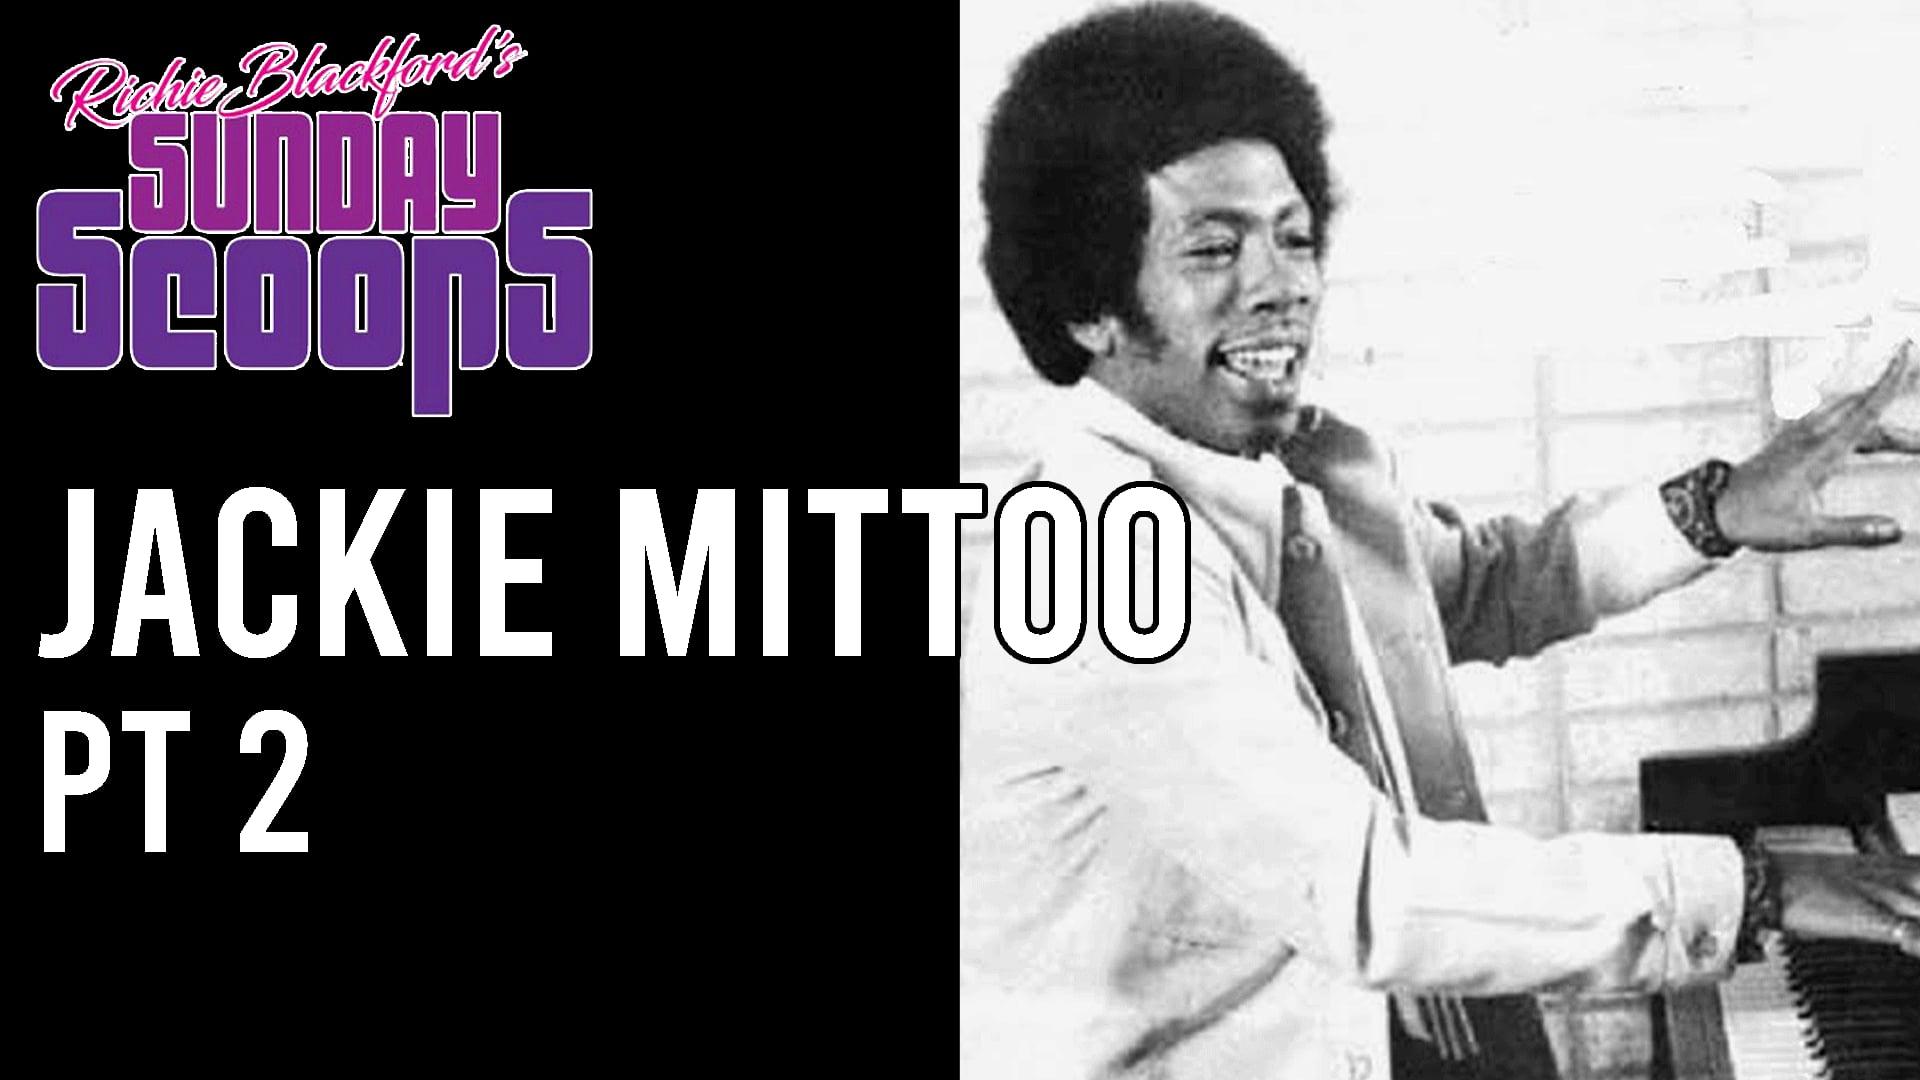 Sunday Scoops Jackie Mittoo pt 2